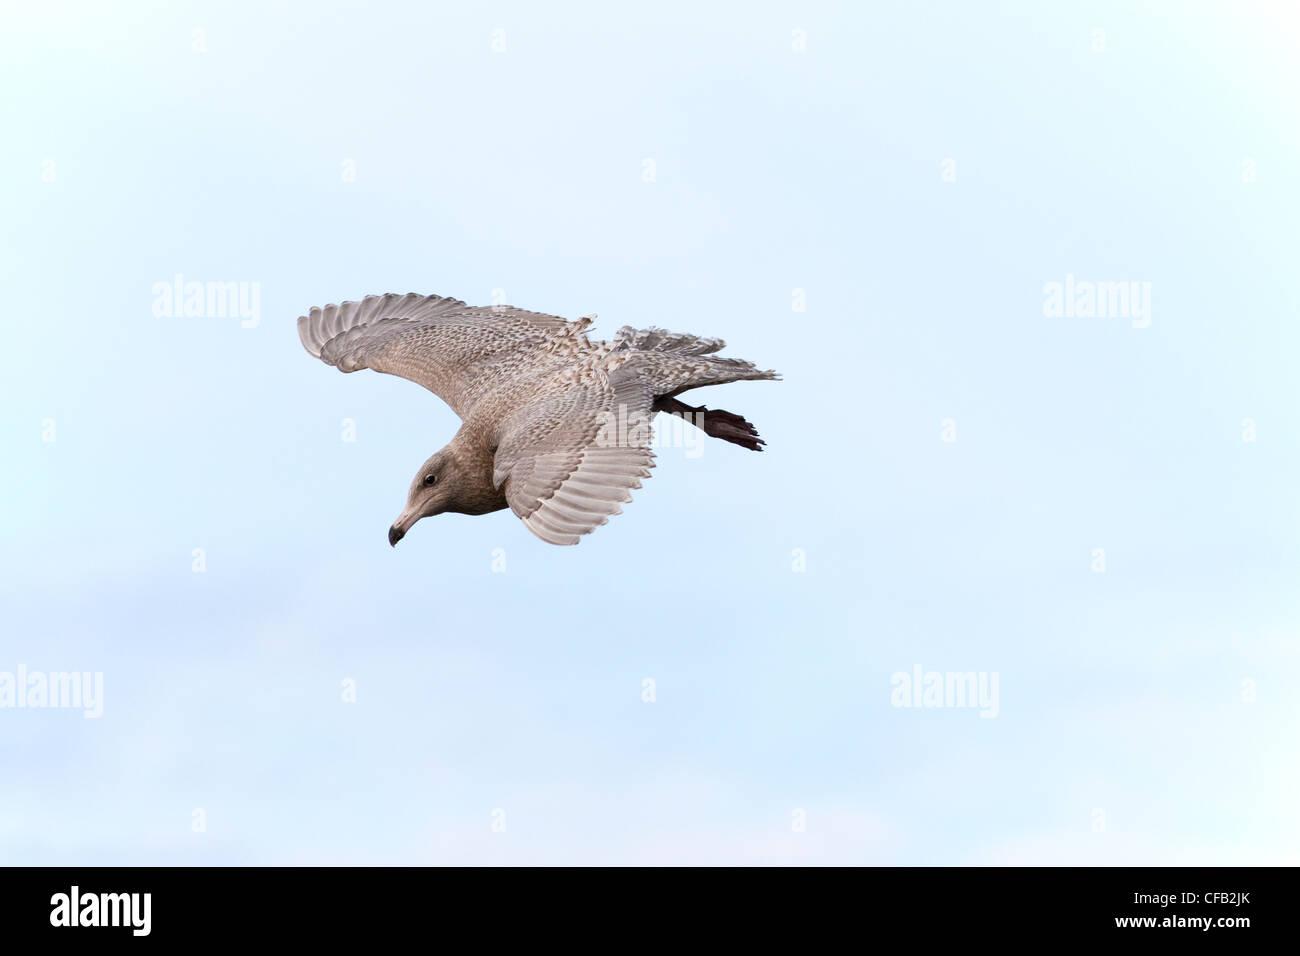 Glaucous Gull Larus hyperboreus immature 1st winter plumage in flight - Stock Image